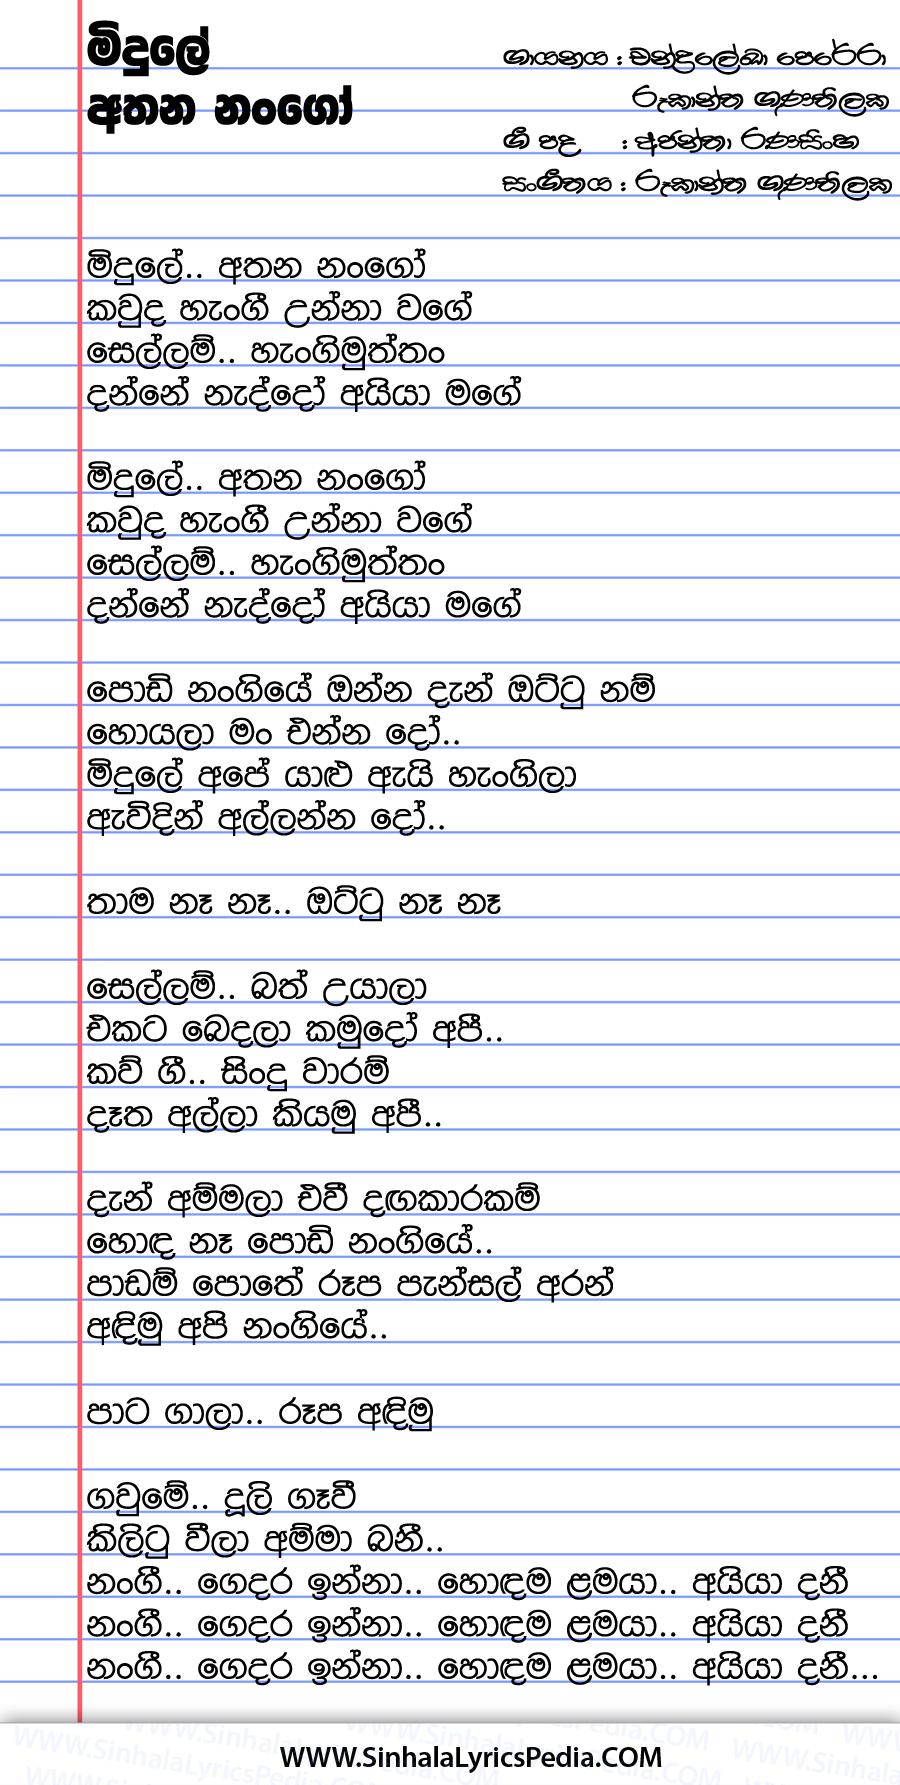 Midule Athana Nango Song Lyrics